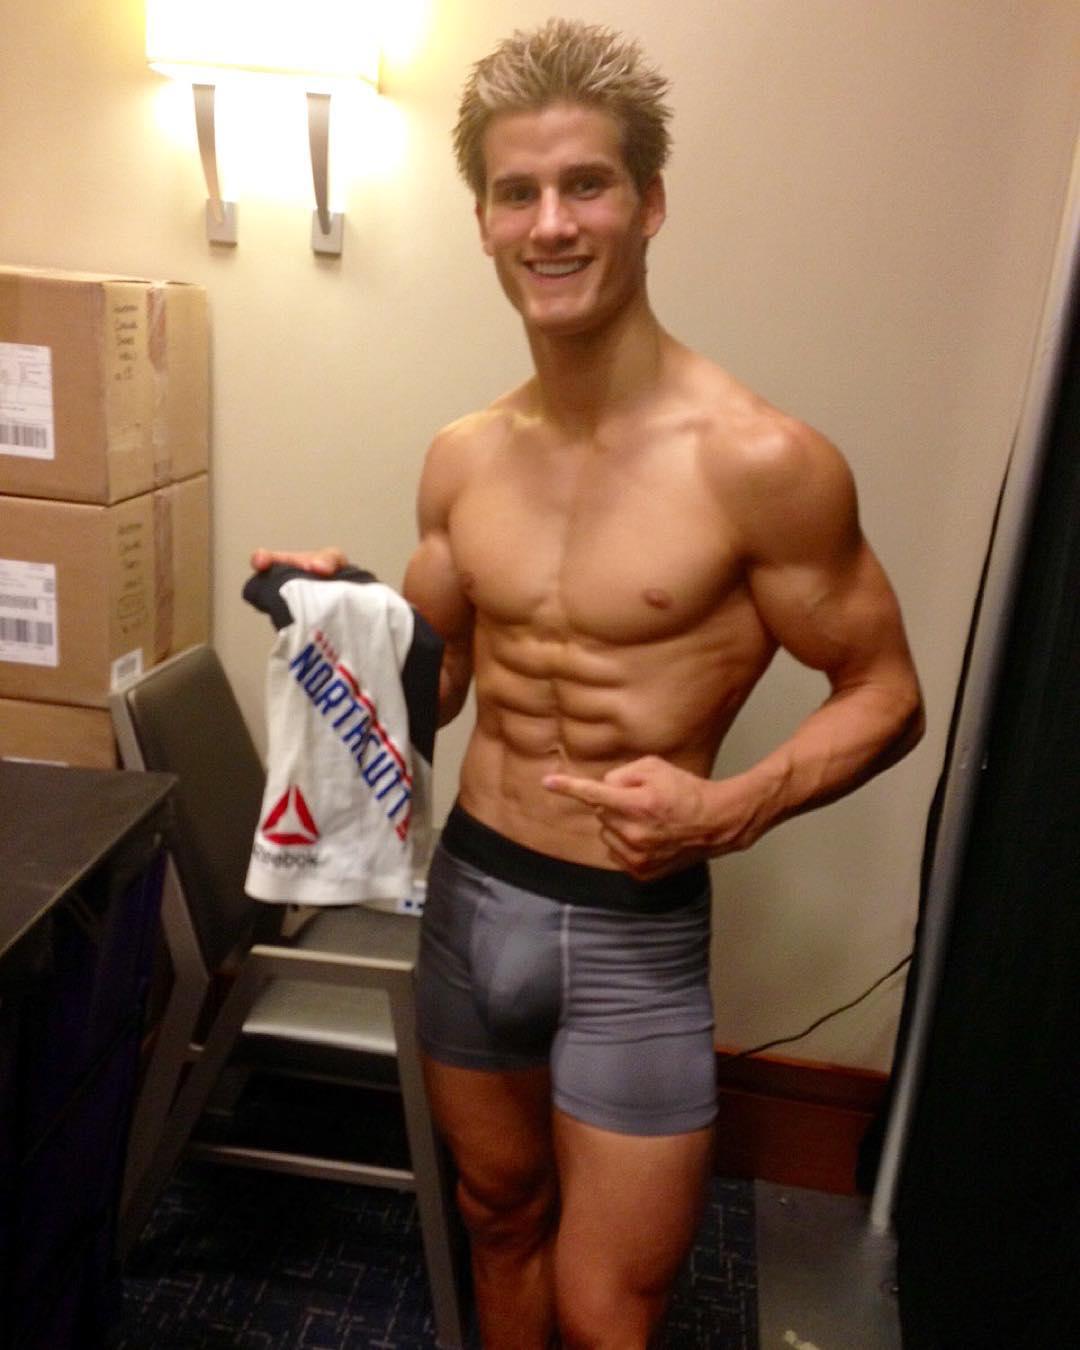 Chuck liddell and heidi northcott's naked workout photo